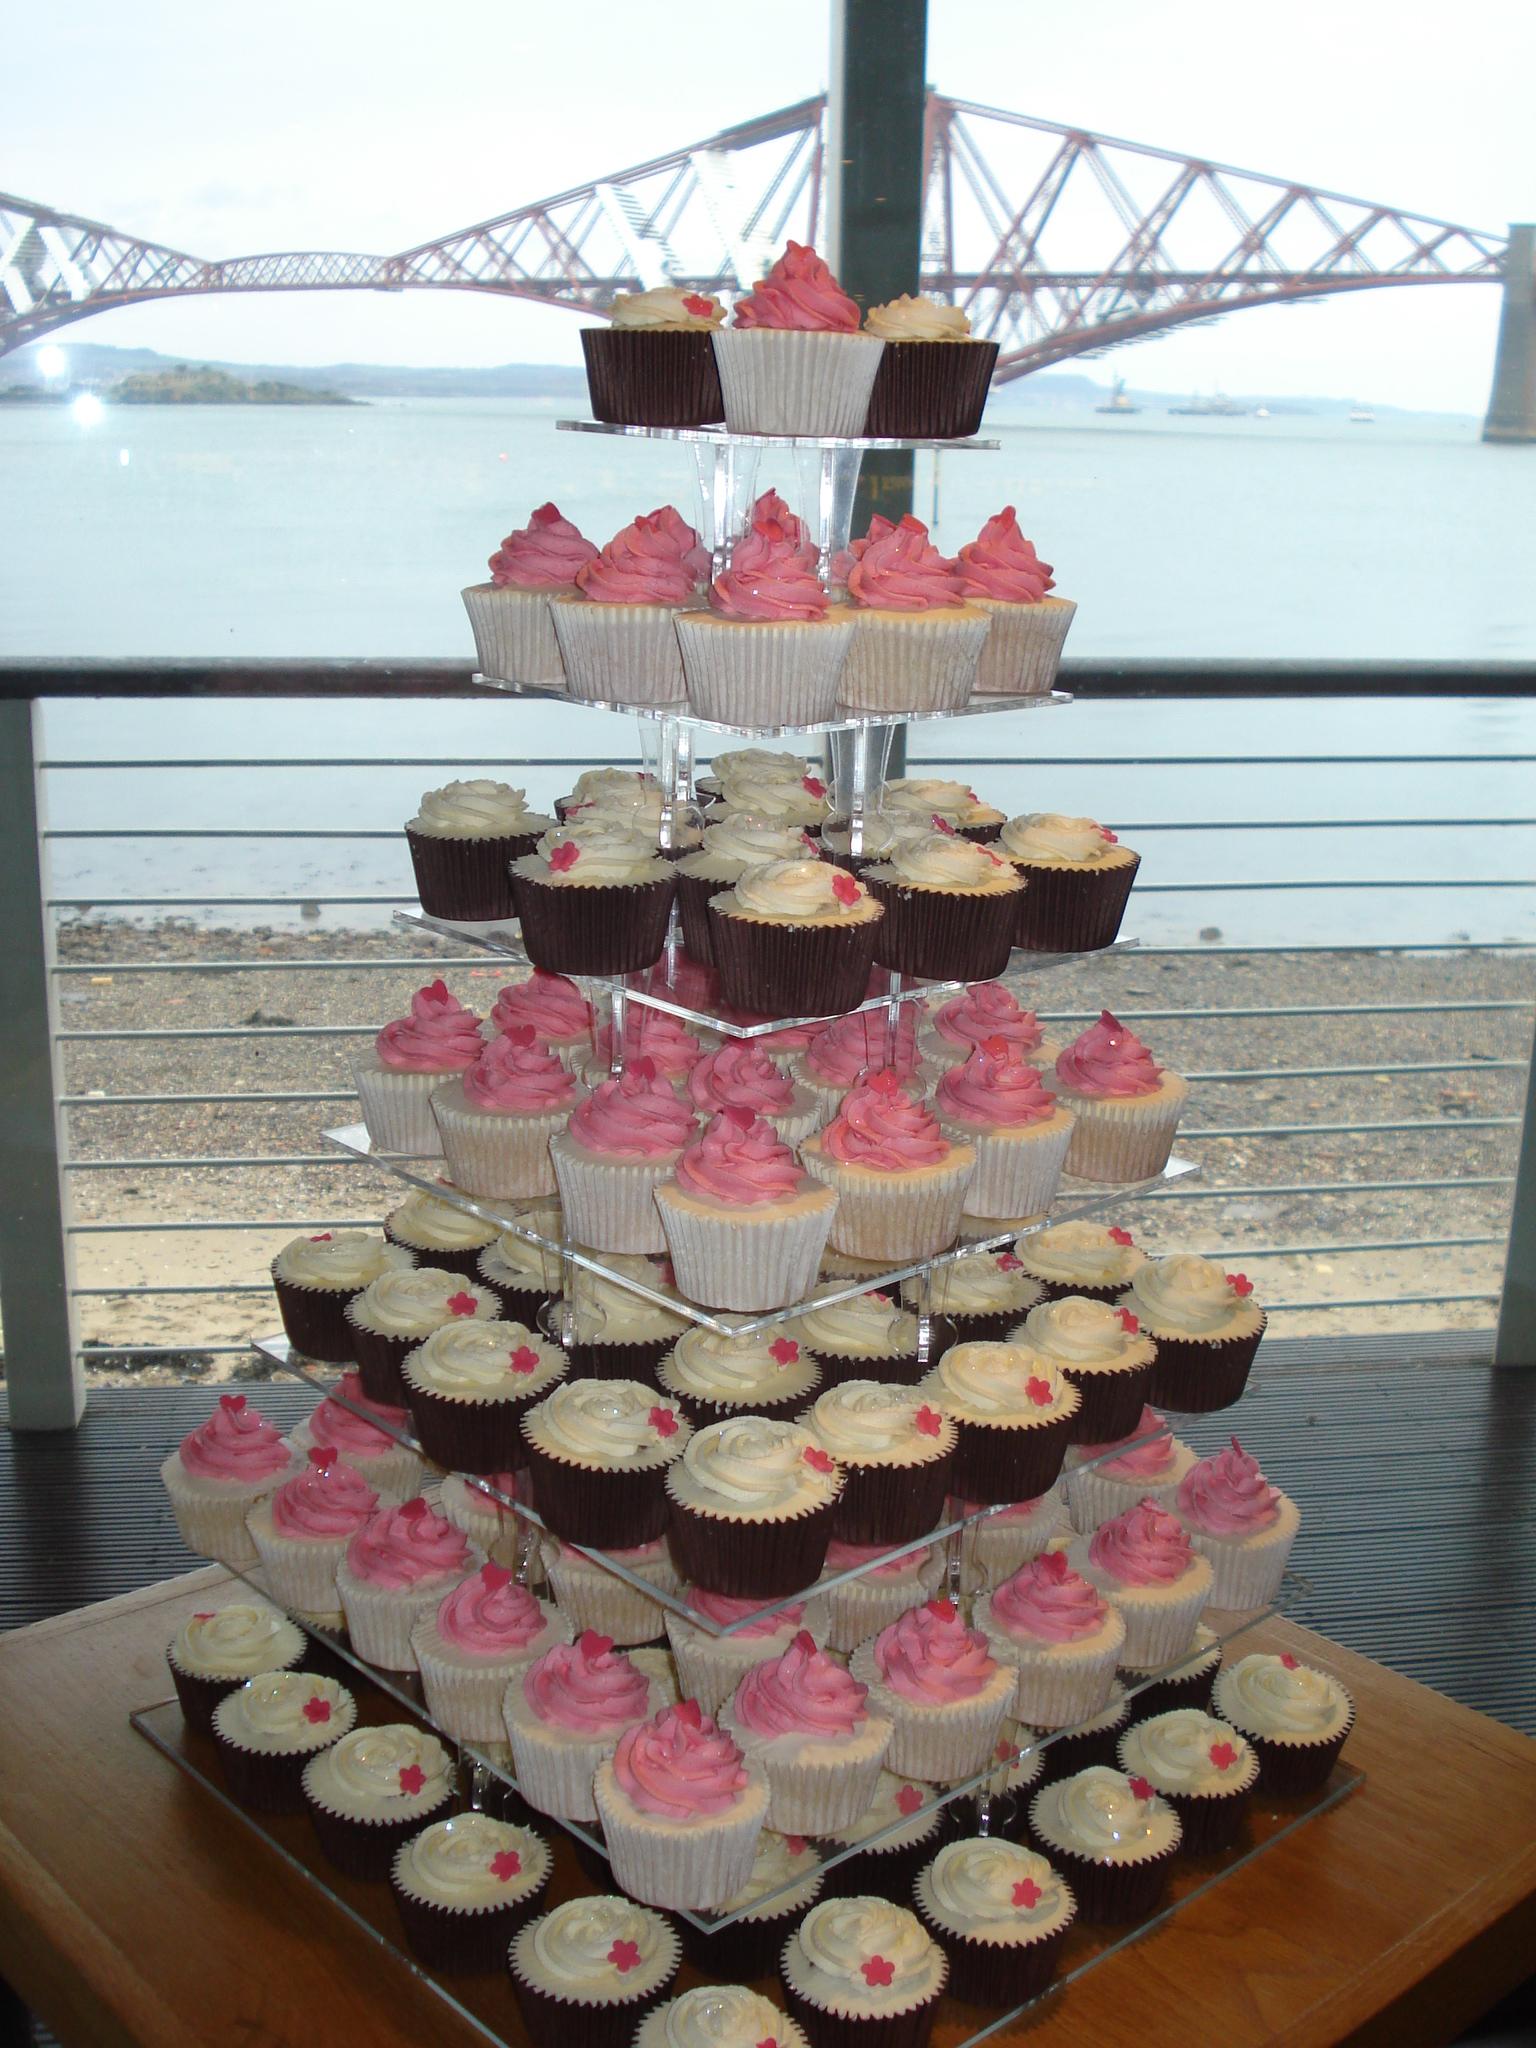 What a wonderful wedding cake backdrop